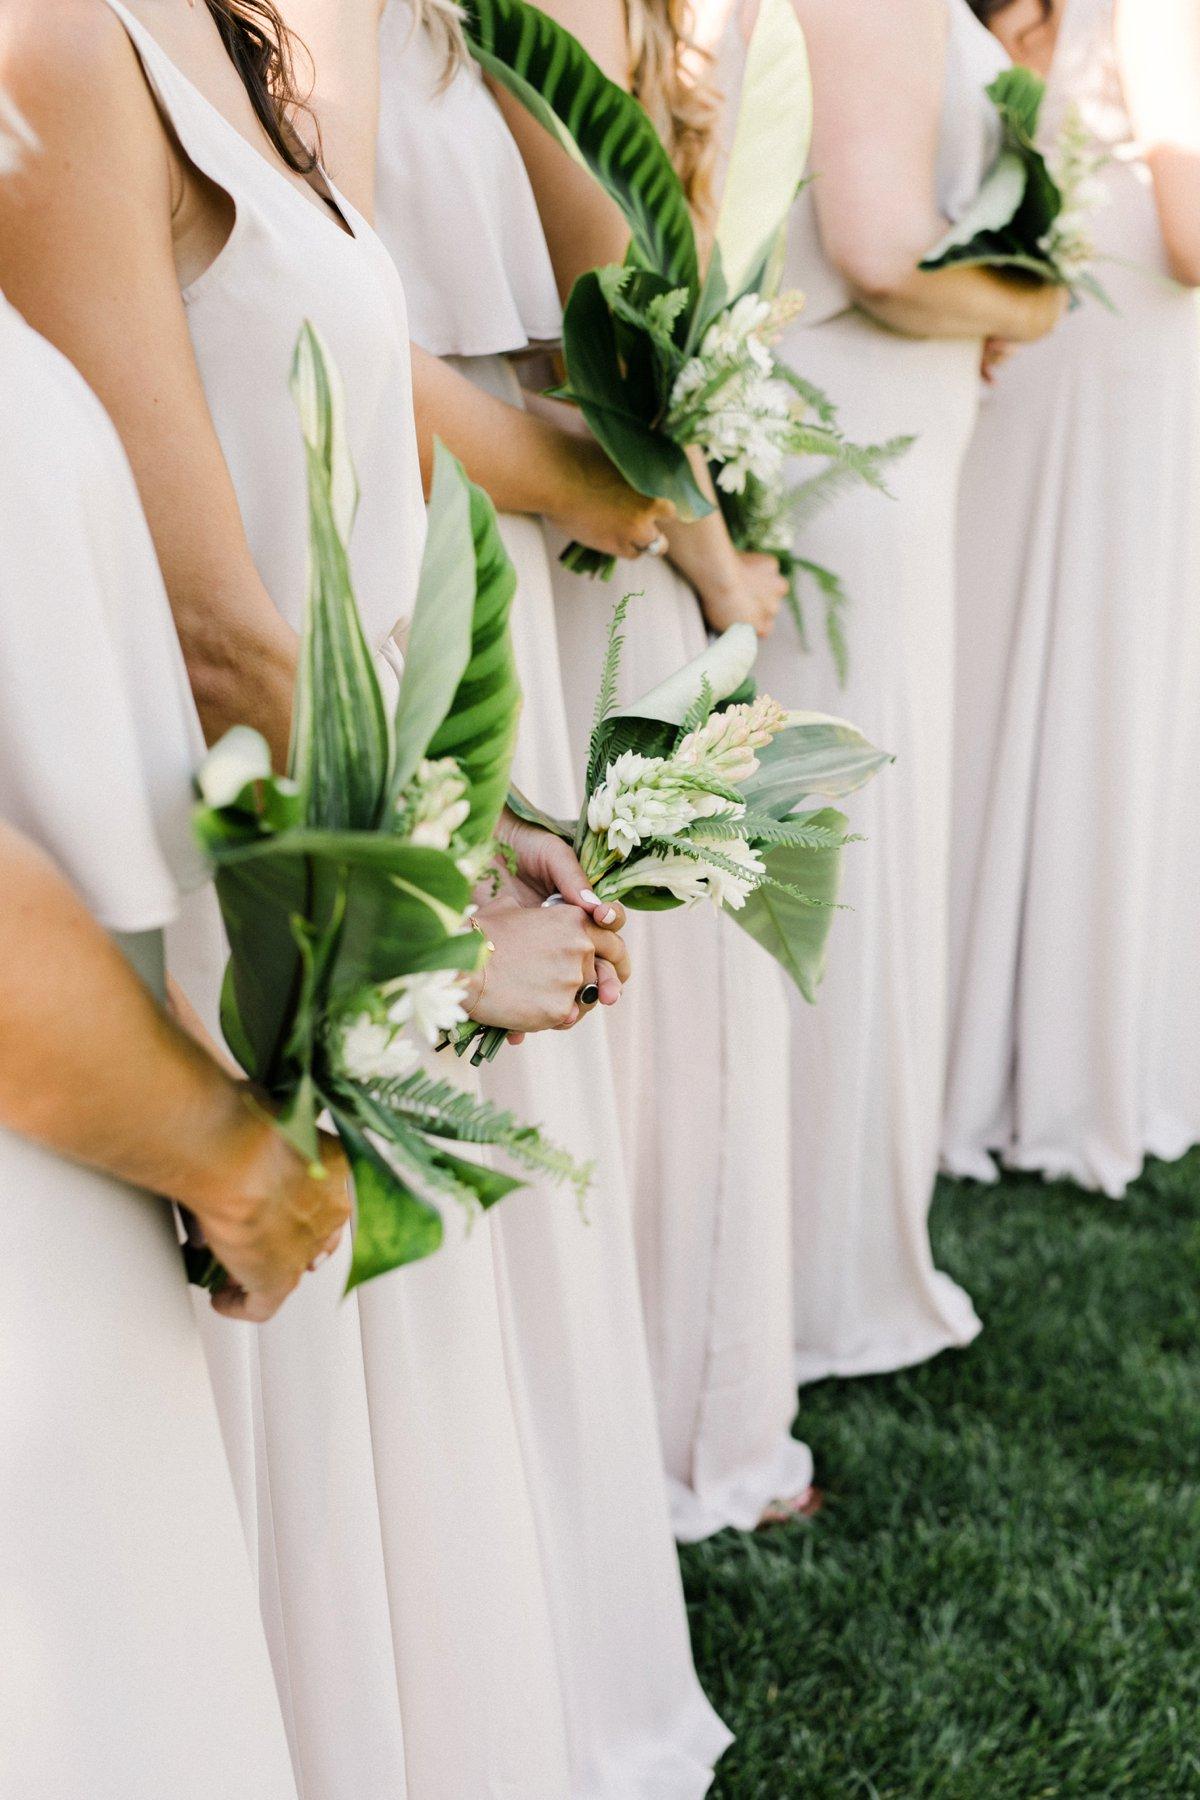 tropical greenery wedding bouquets - photo by Anna Delores http://ruffledblog.com/chic-modern-wedding-at-four-seasons-santa-barbara